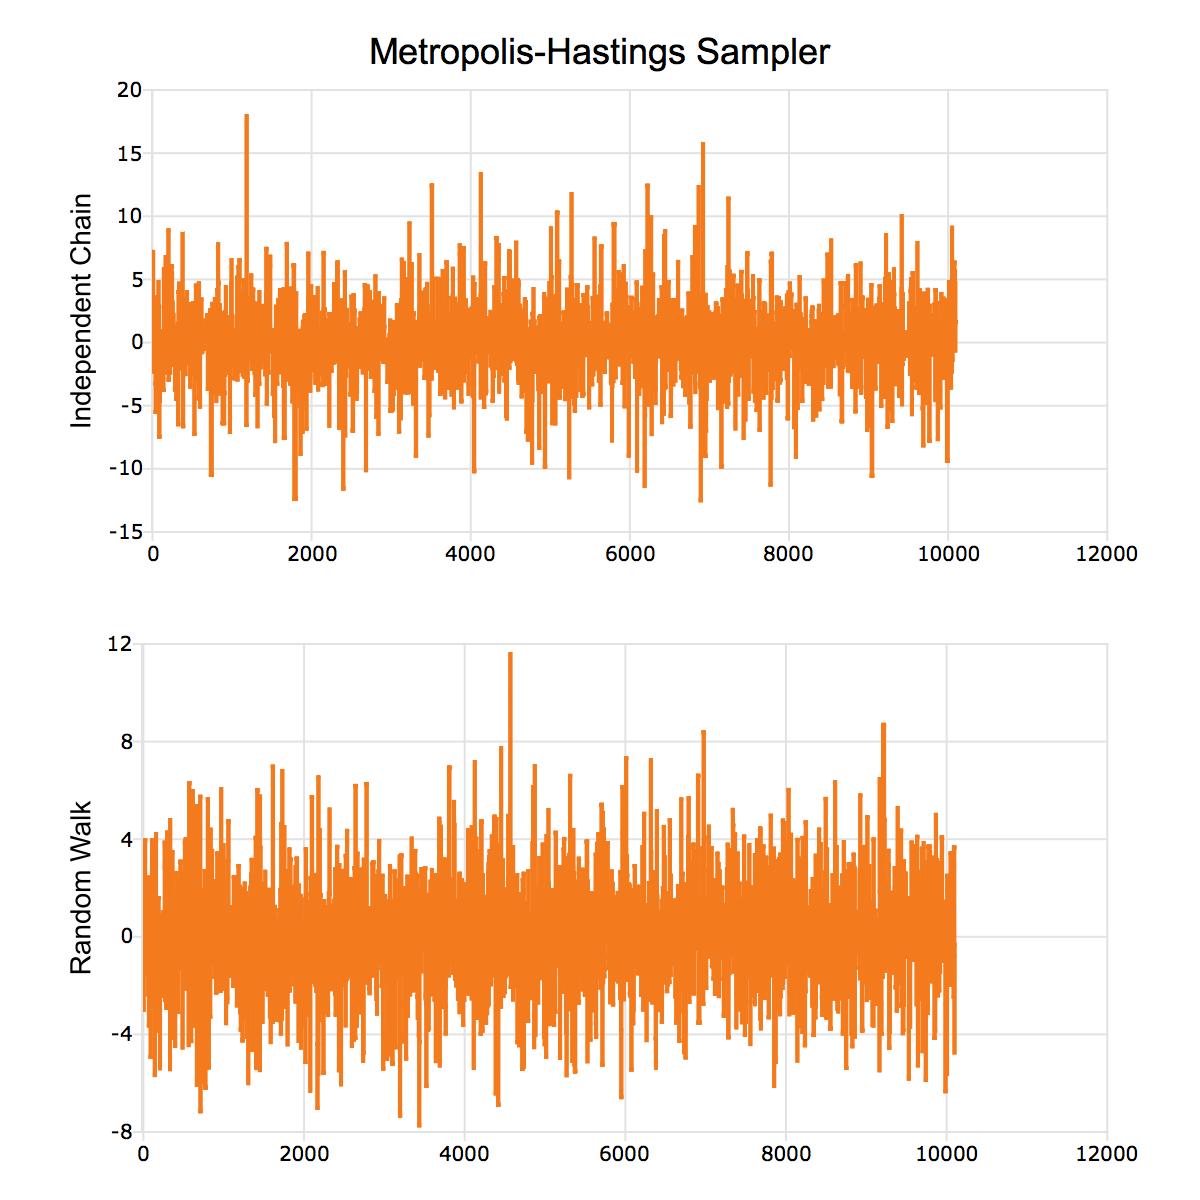 bayesian_tutorial_metropolis_hastings_1 | Aptech